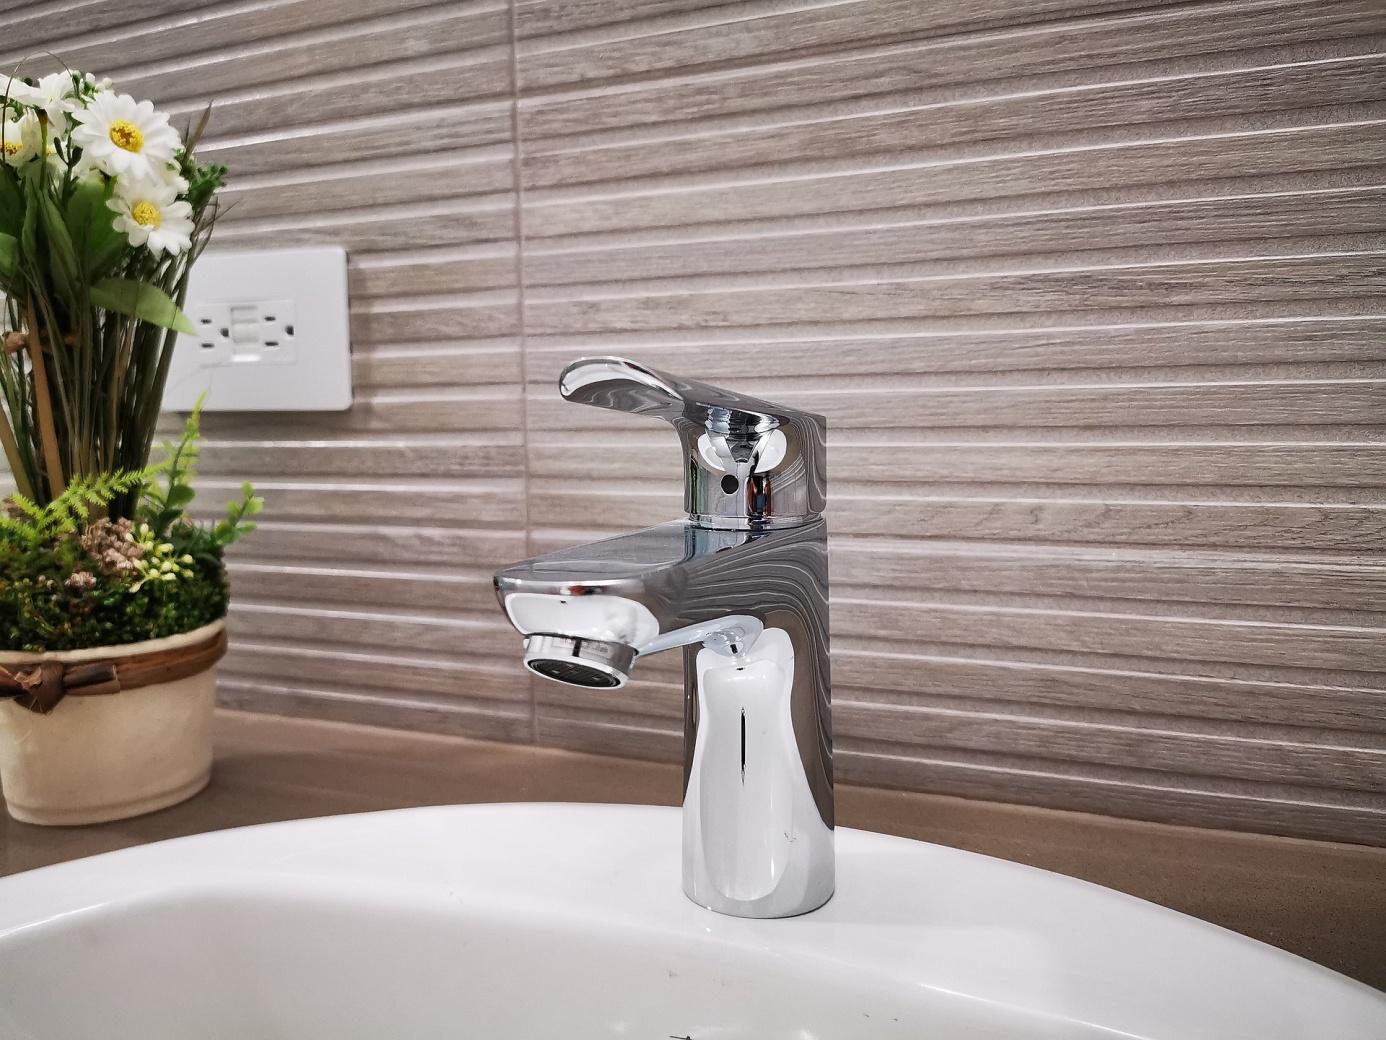 bathroom-4575049_1920.jpg